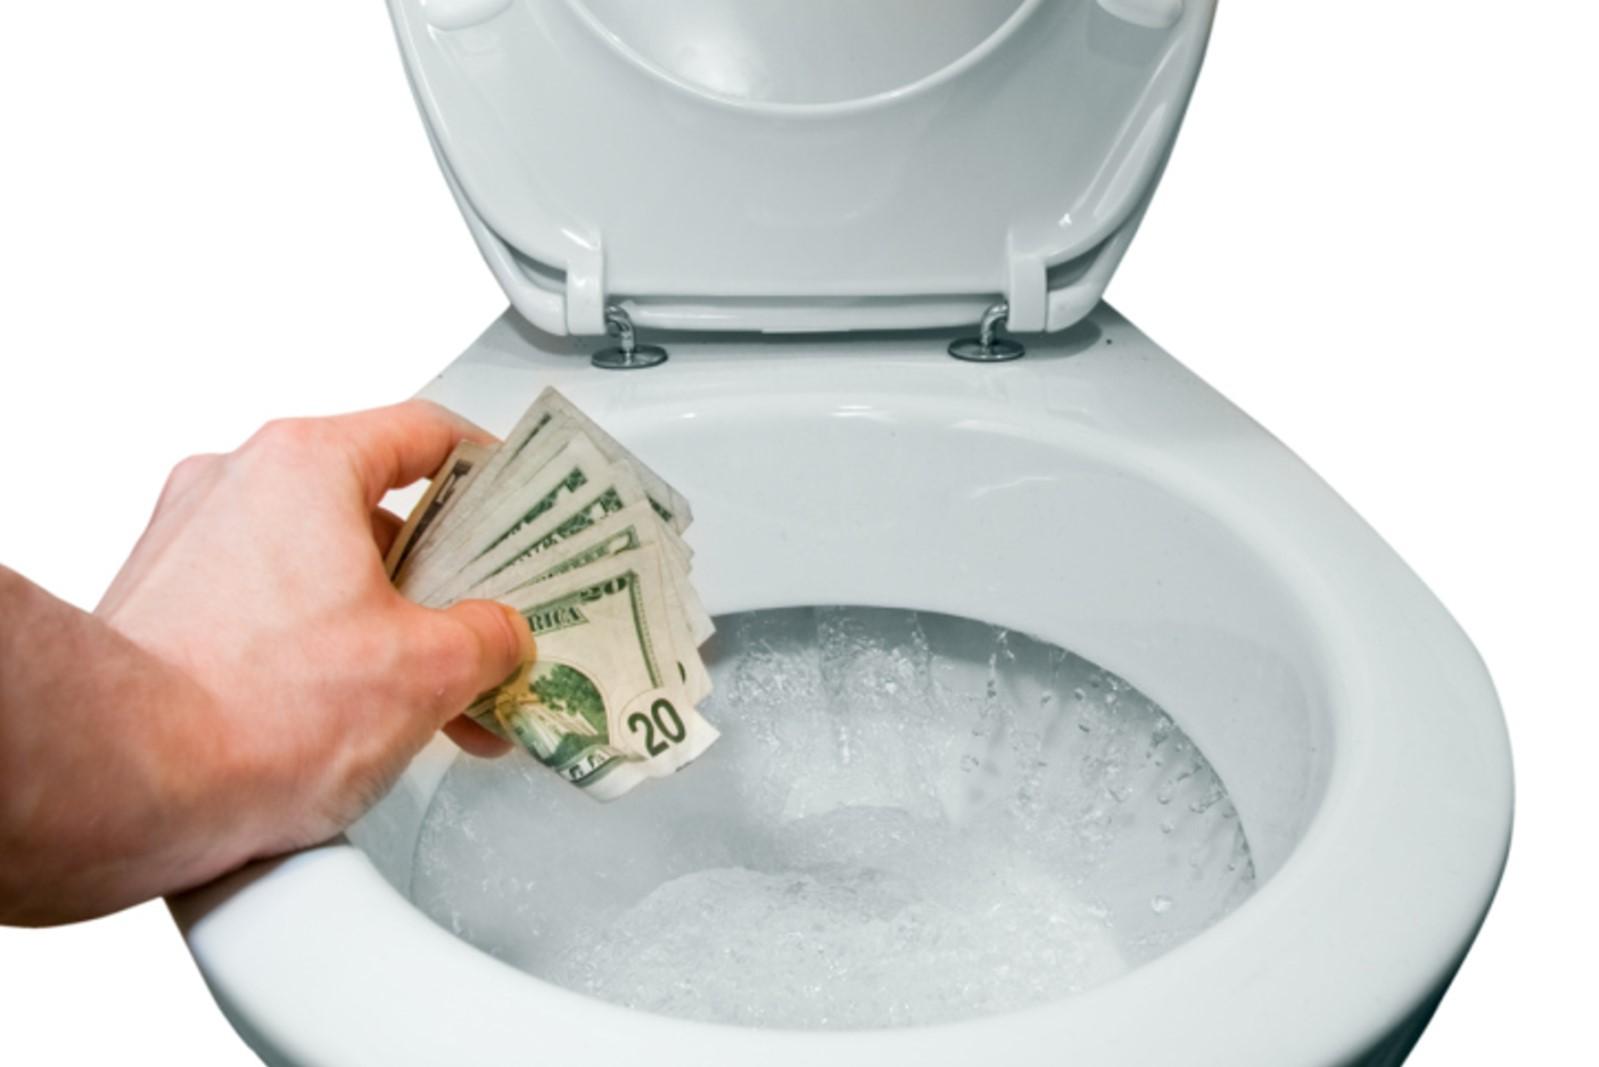 Plumbing Tip - Easily Fix a Running Toilet